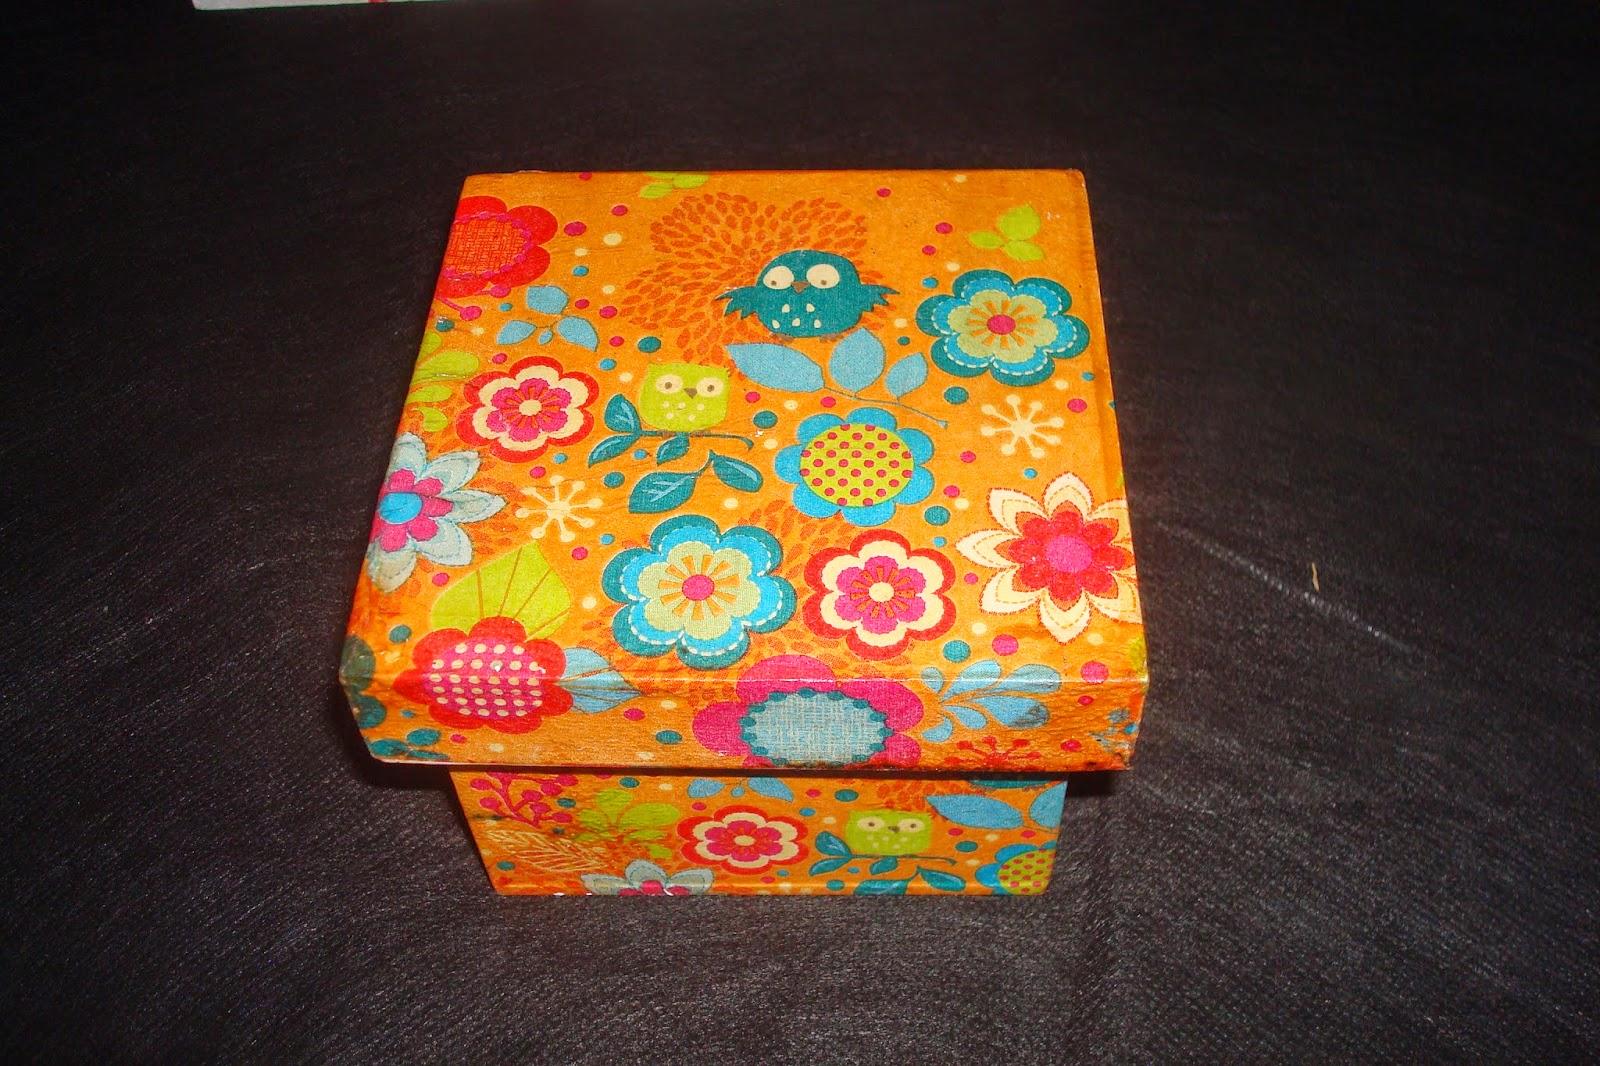 caja con mandala cajas decoradas t cajas. Black Bedroom Furniture Sets. Home Design Ideas